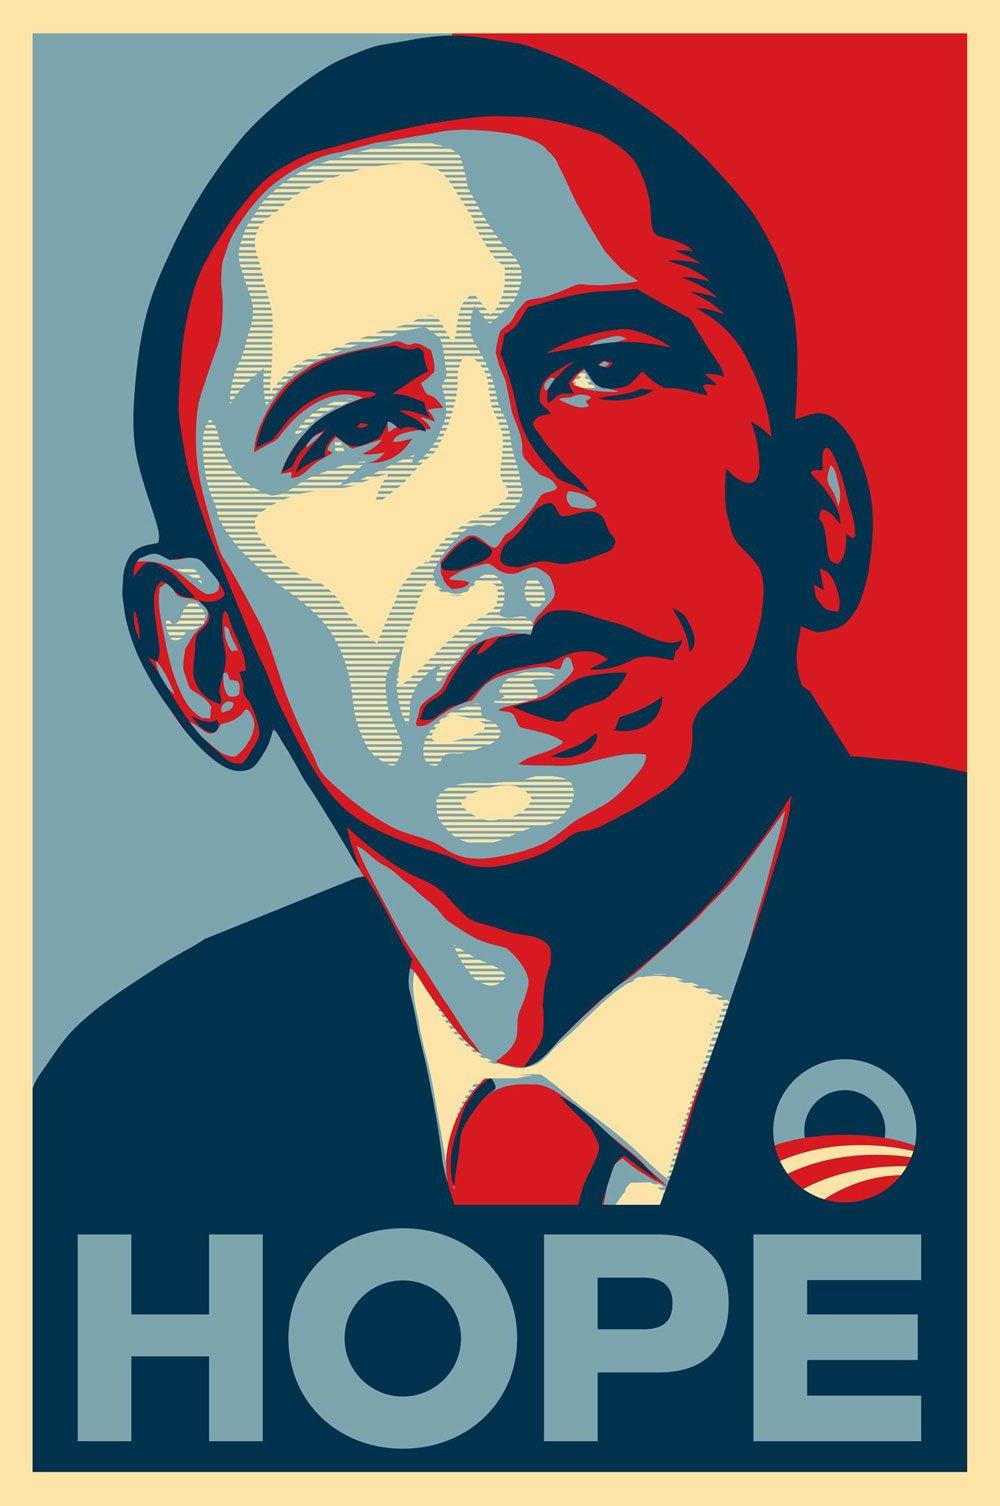 Shepard Fairey, Obey, Street Art, Street Art exhibition, obama, hope